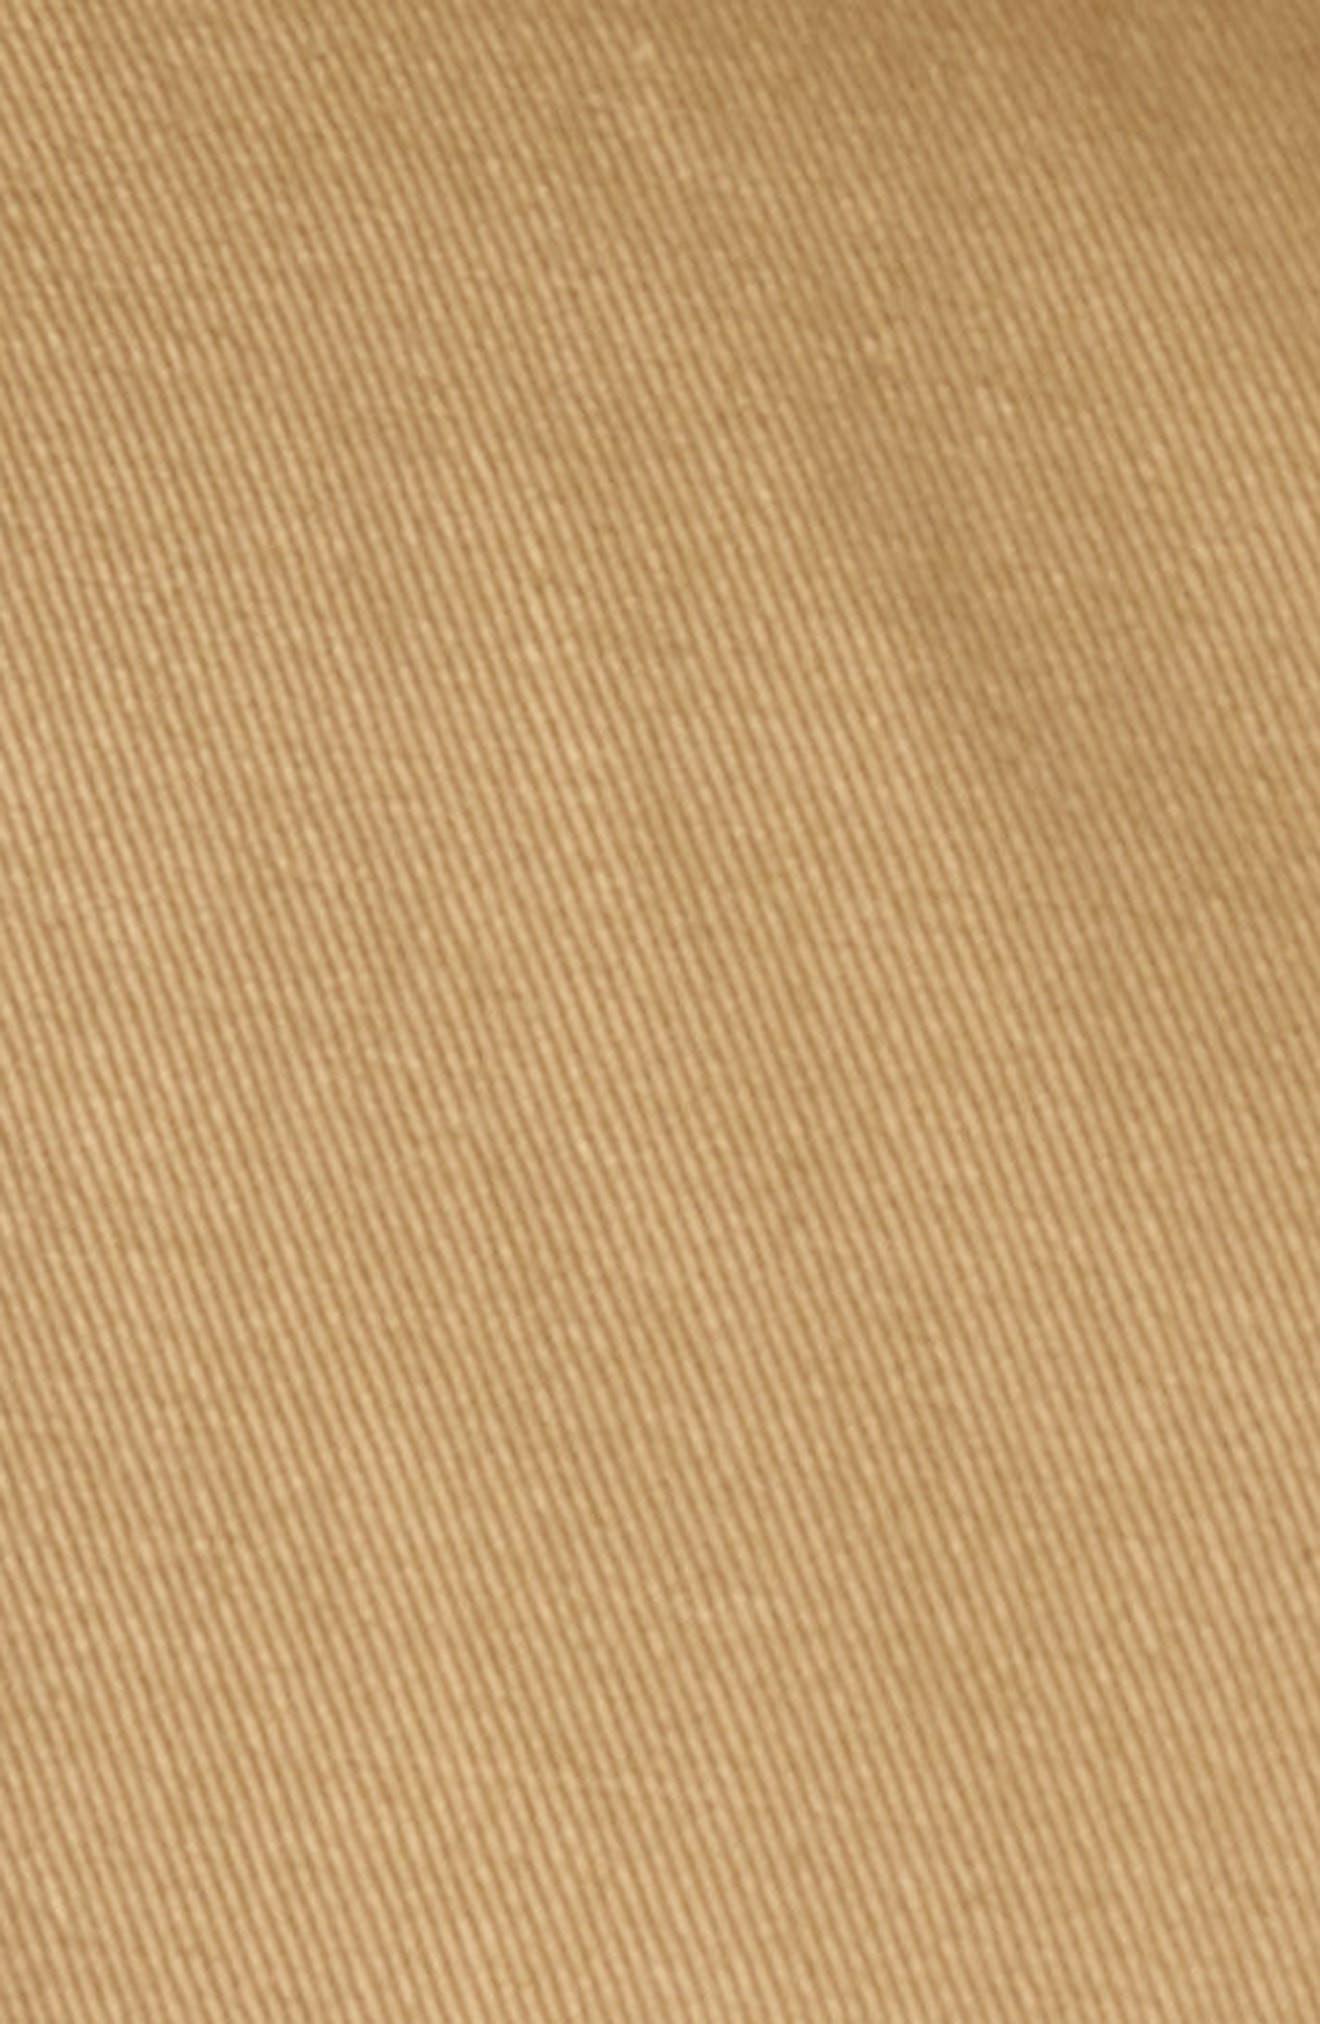 M3 Straight Fit Vintage Twill Flat Front Pants,                             Alternate thumbnail 5, color,                             British Khaki